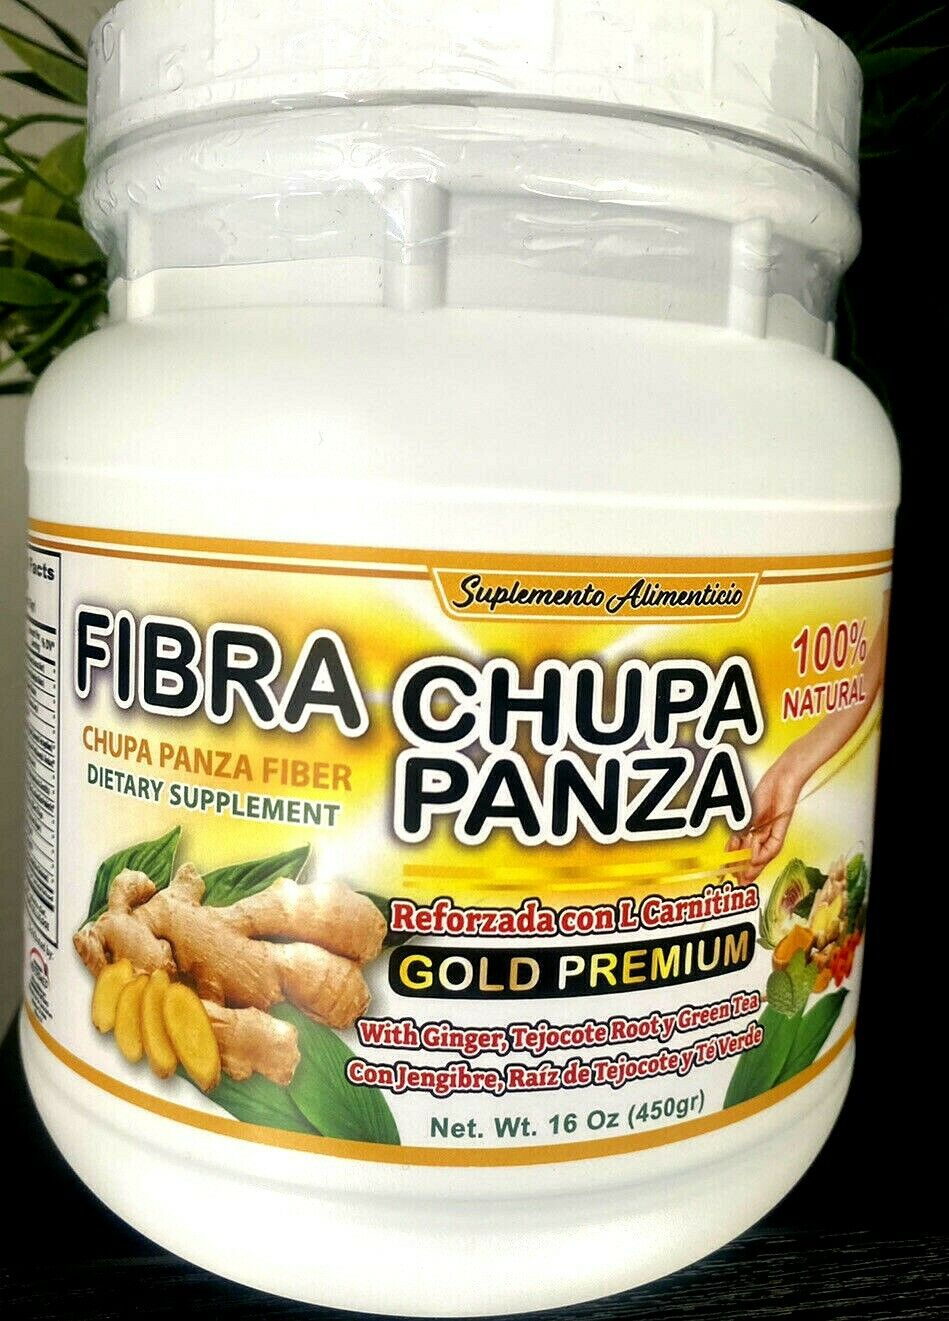 Fibra Chupa Panza100% Natural PREMIUM L CARNITINA 16oz TEJOCOTE ROOT & GREEN TEA 1